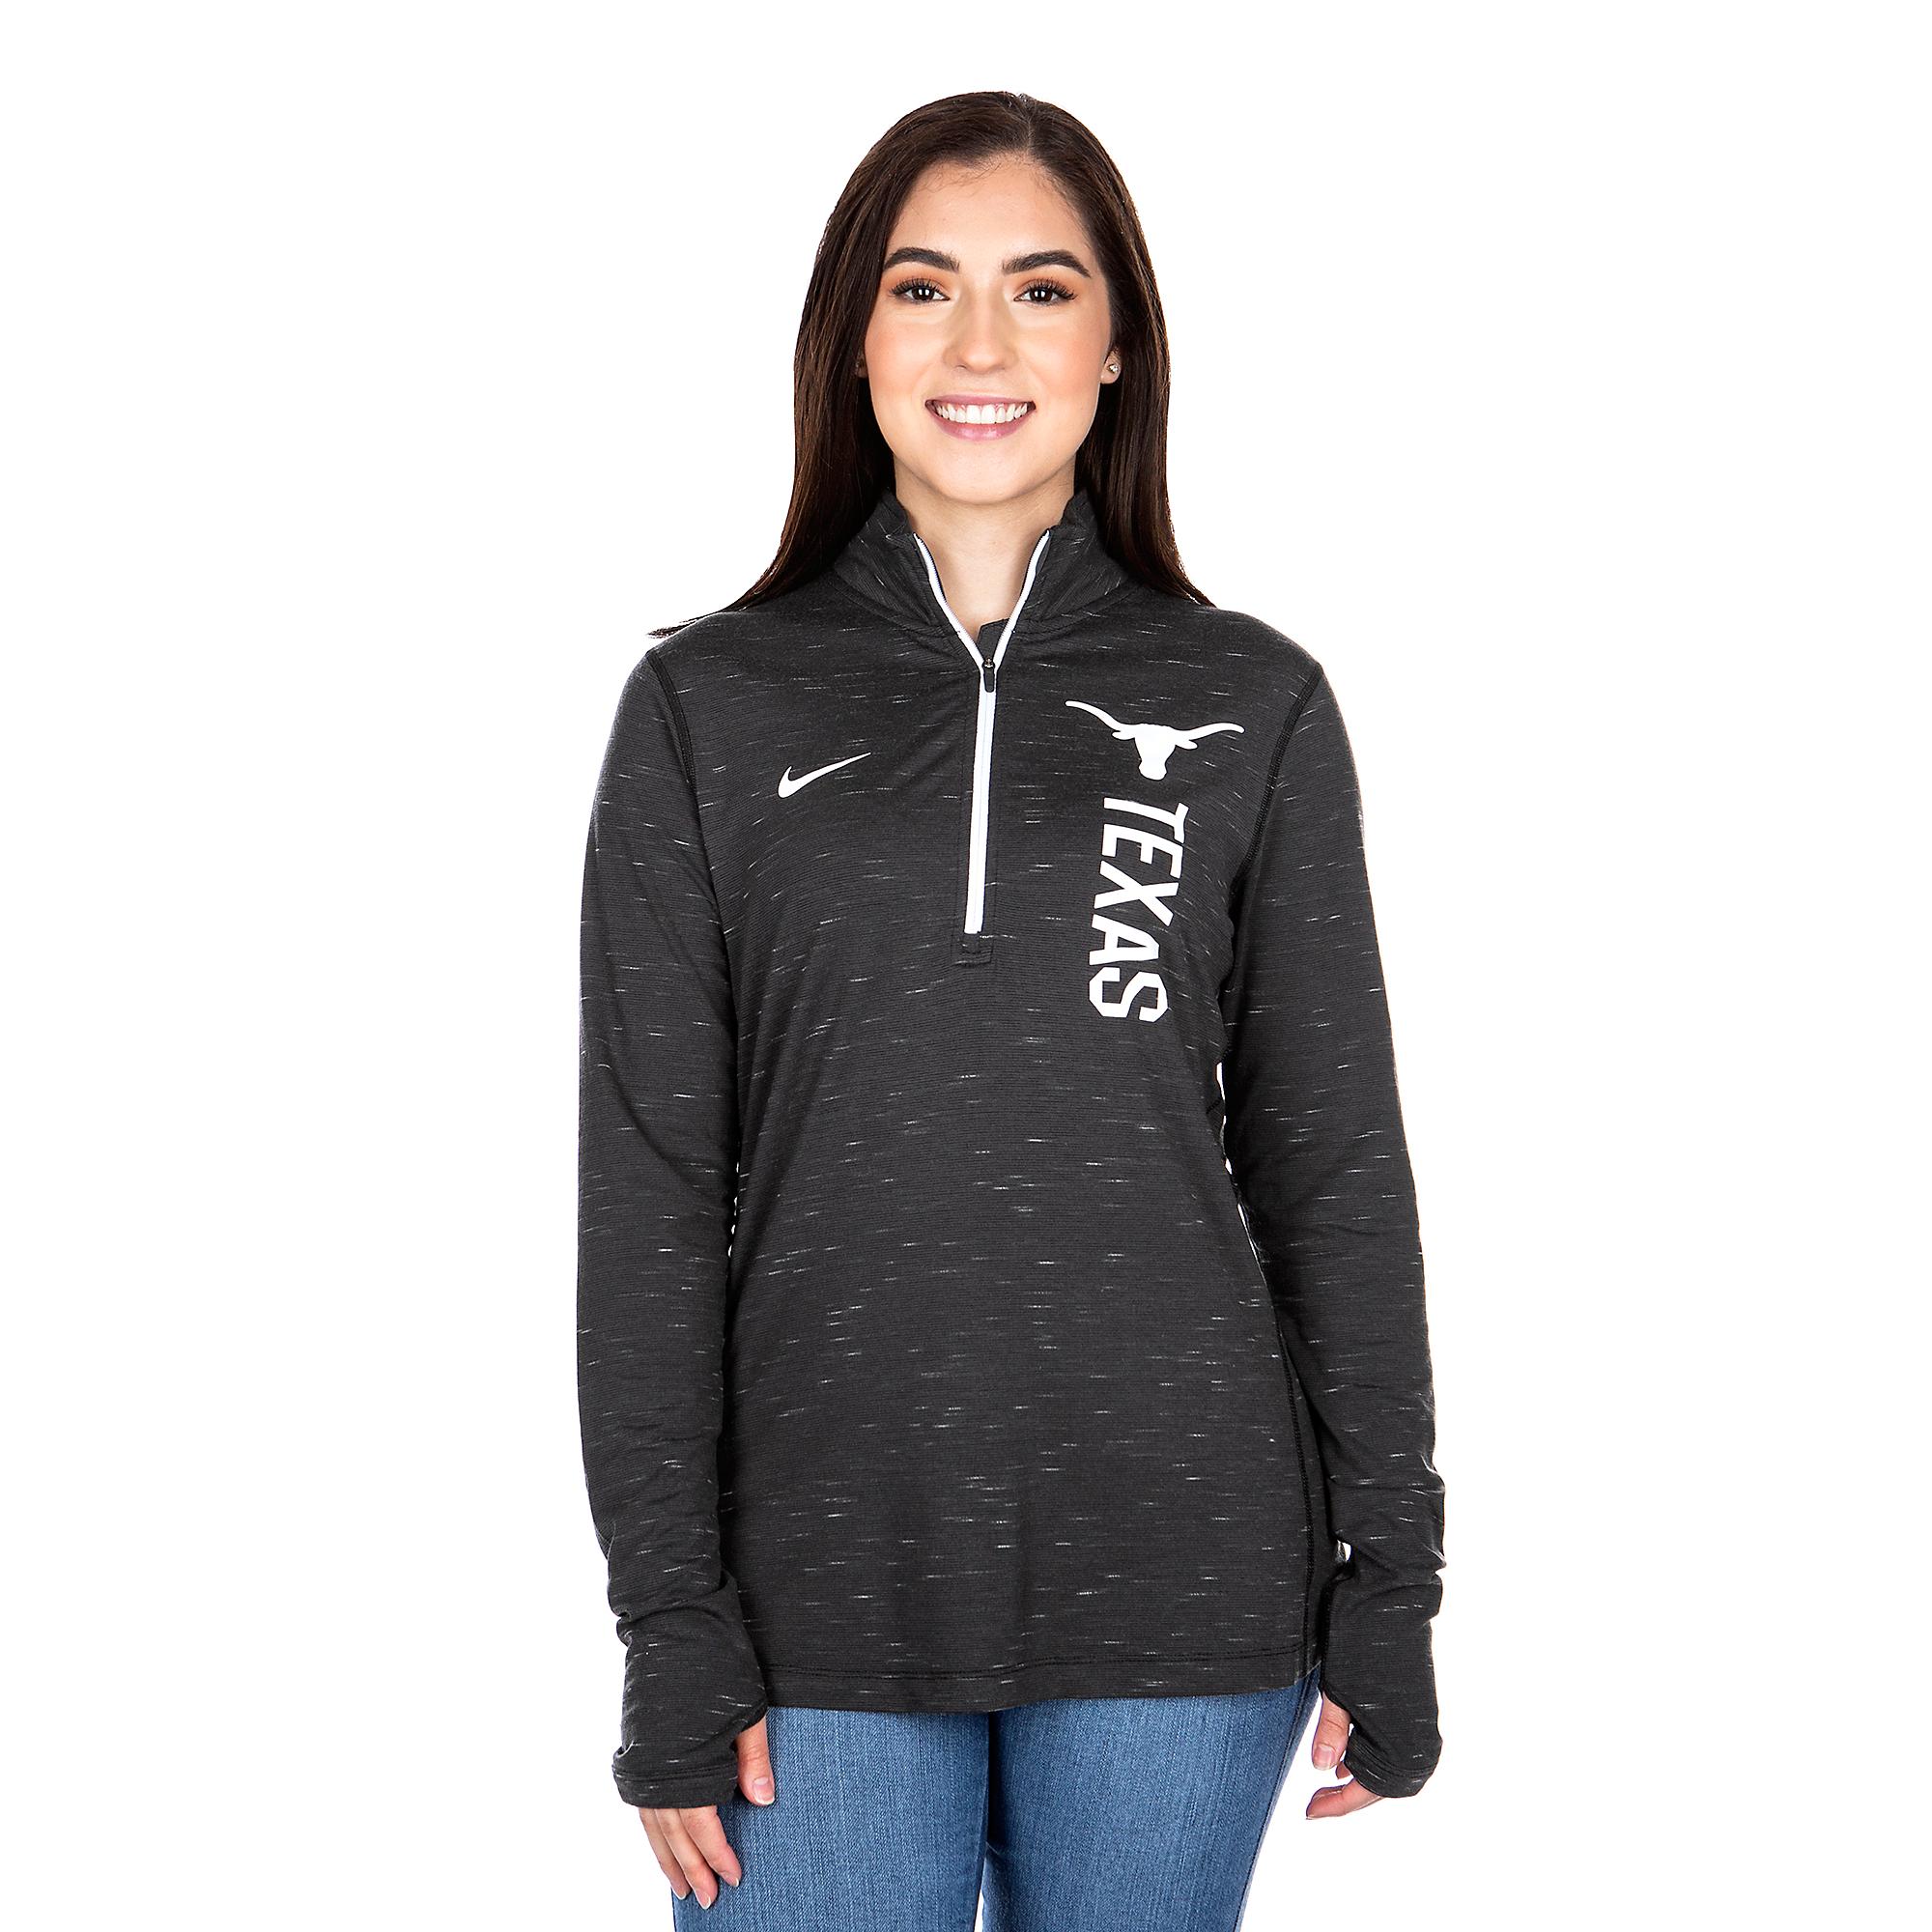 Texas Longhorns Womens Nike Dry Element Pullover